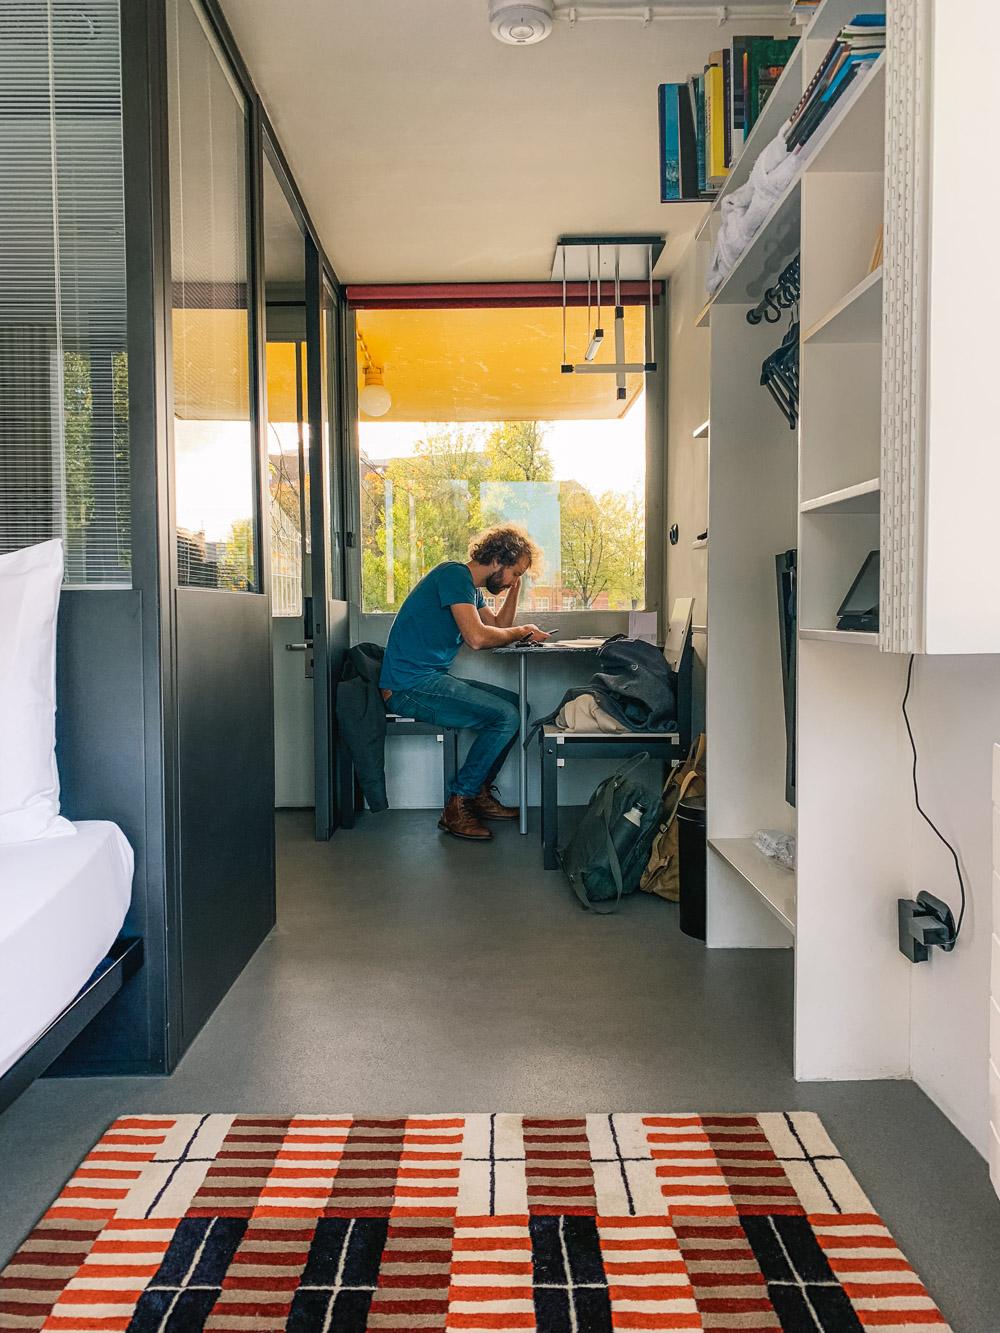 brugwachtershuisje amsterdam tiny house